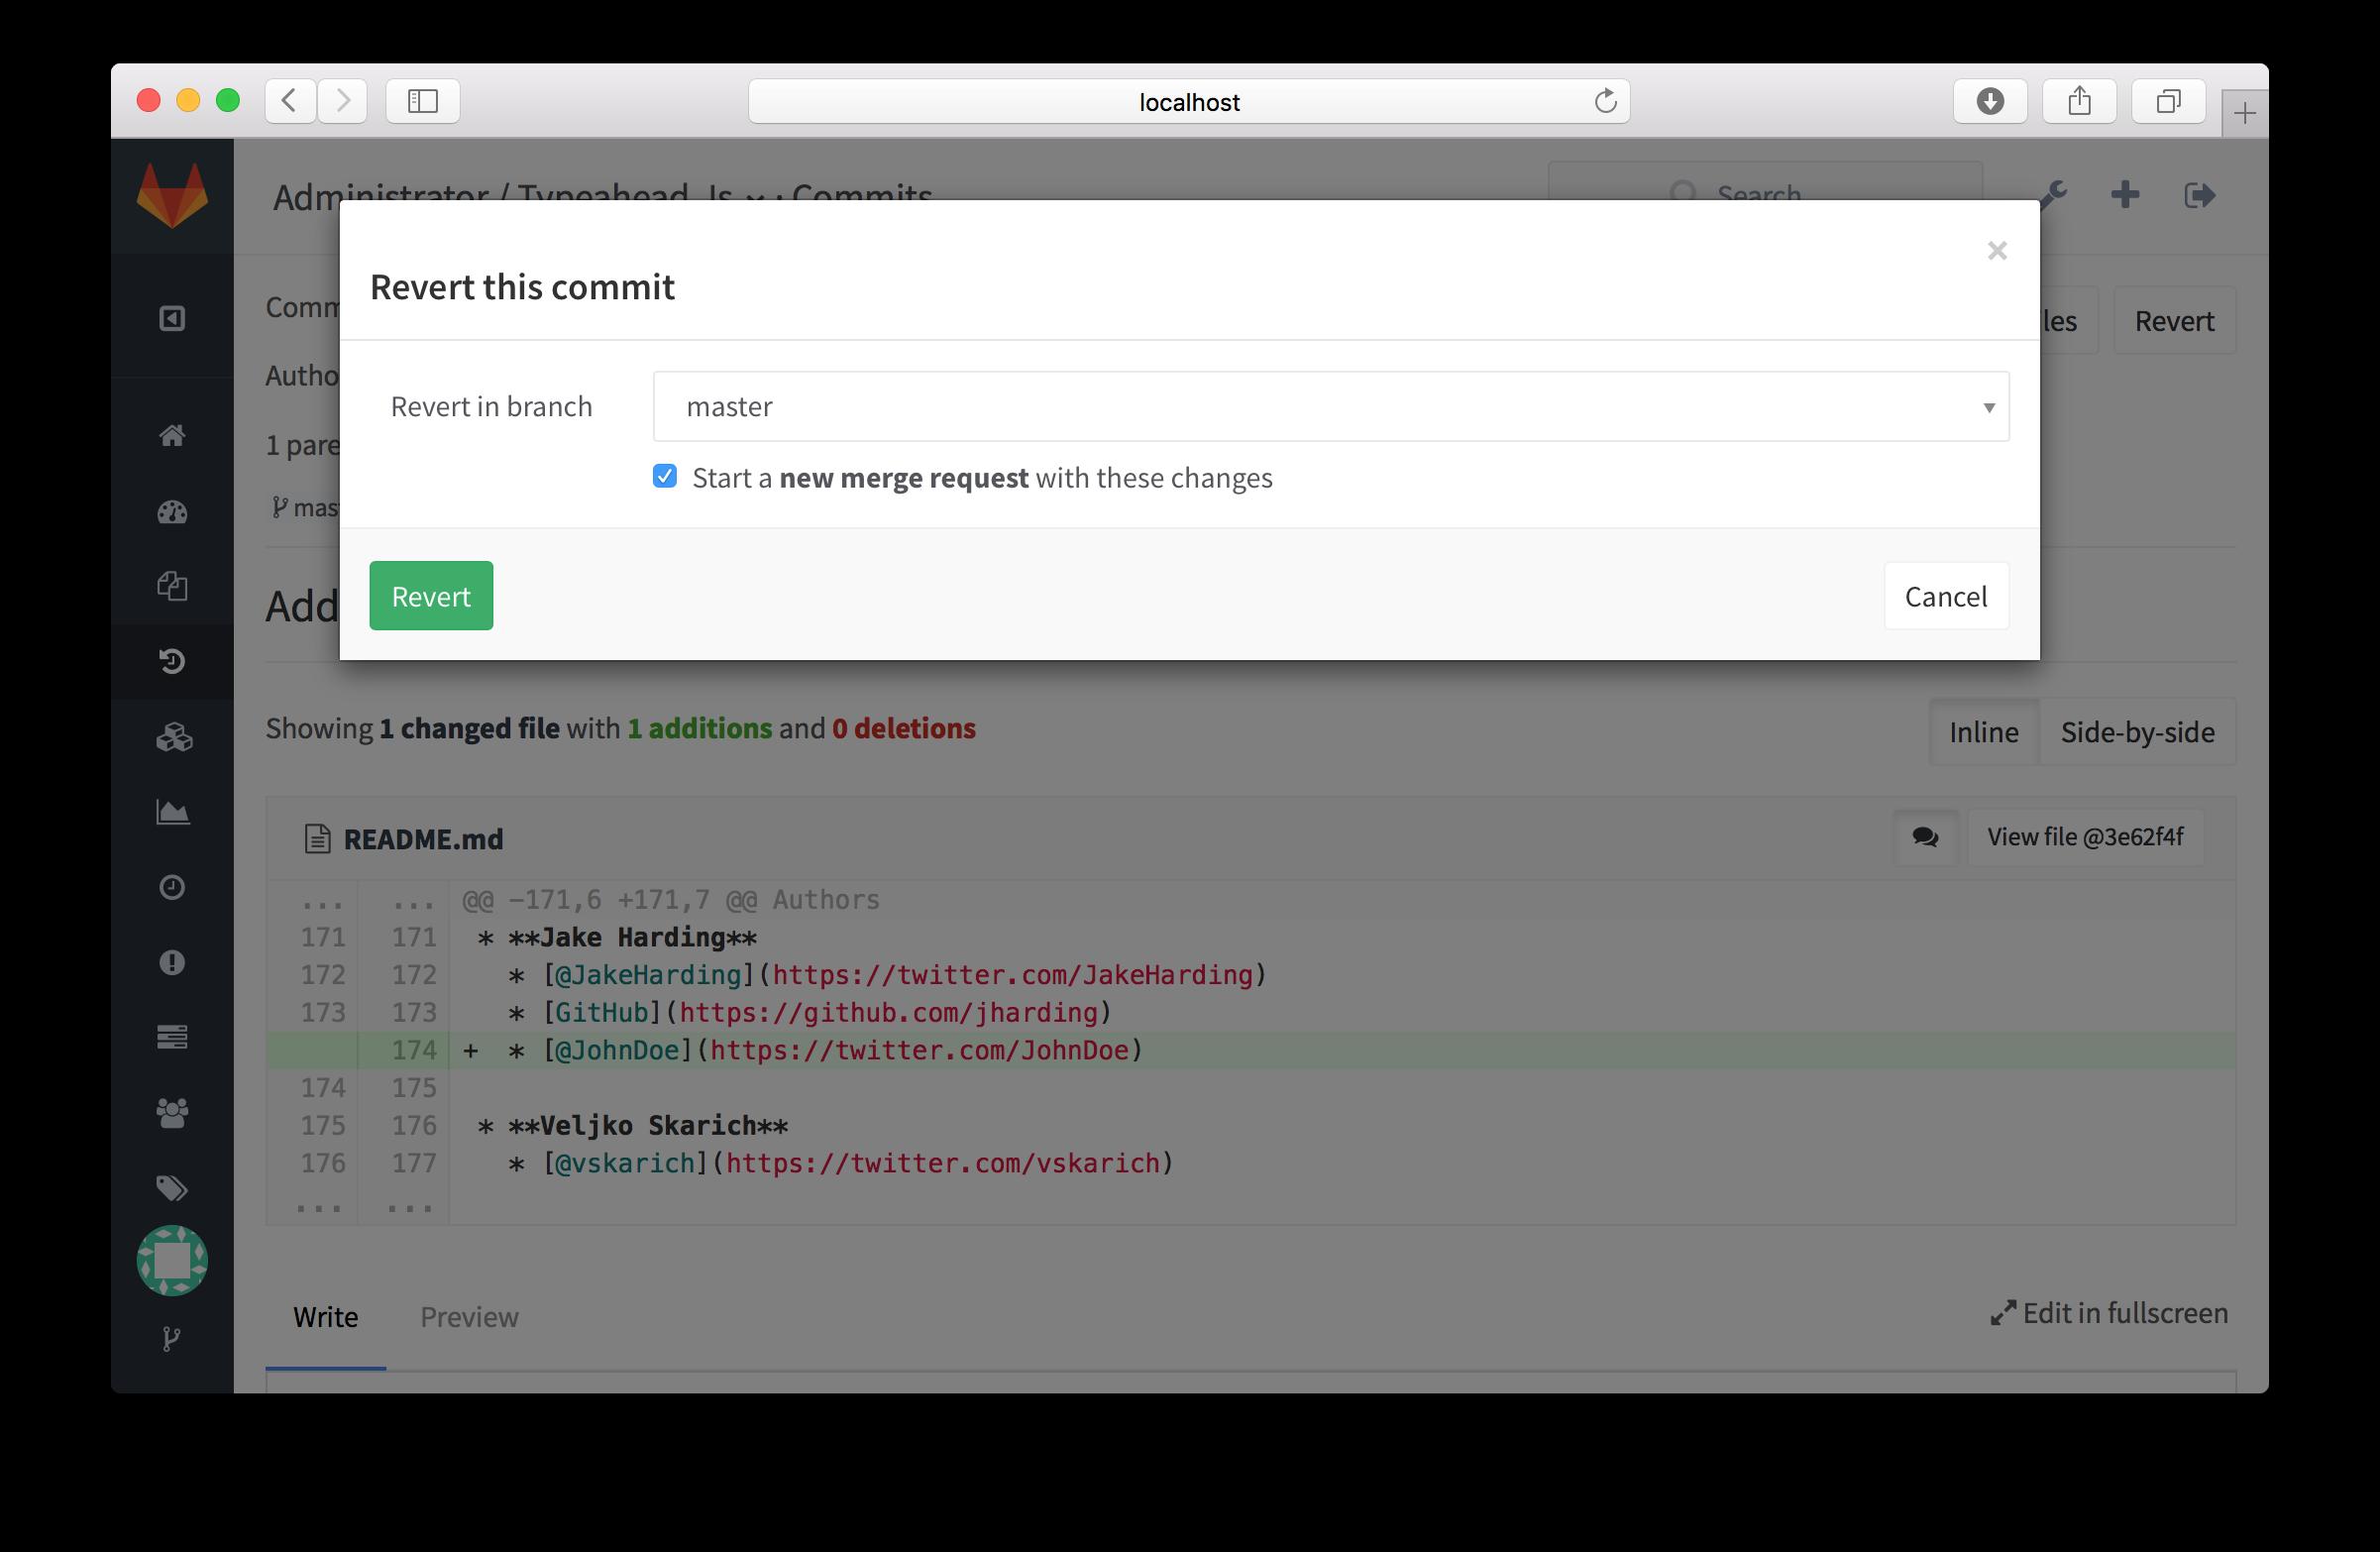 doc/workflow/revert_changes/revert-commit-modal.png